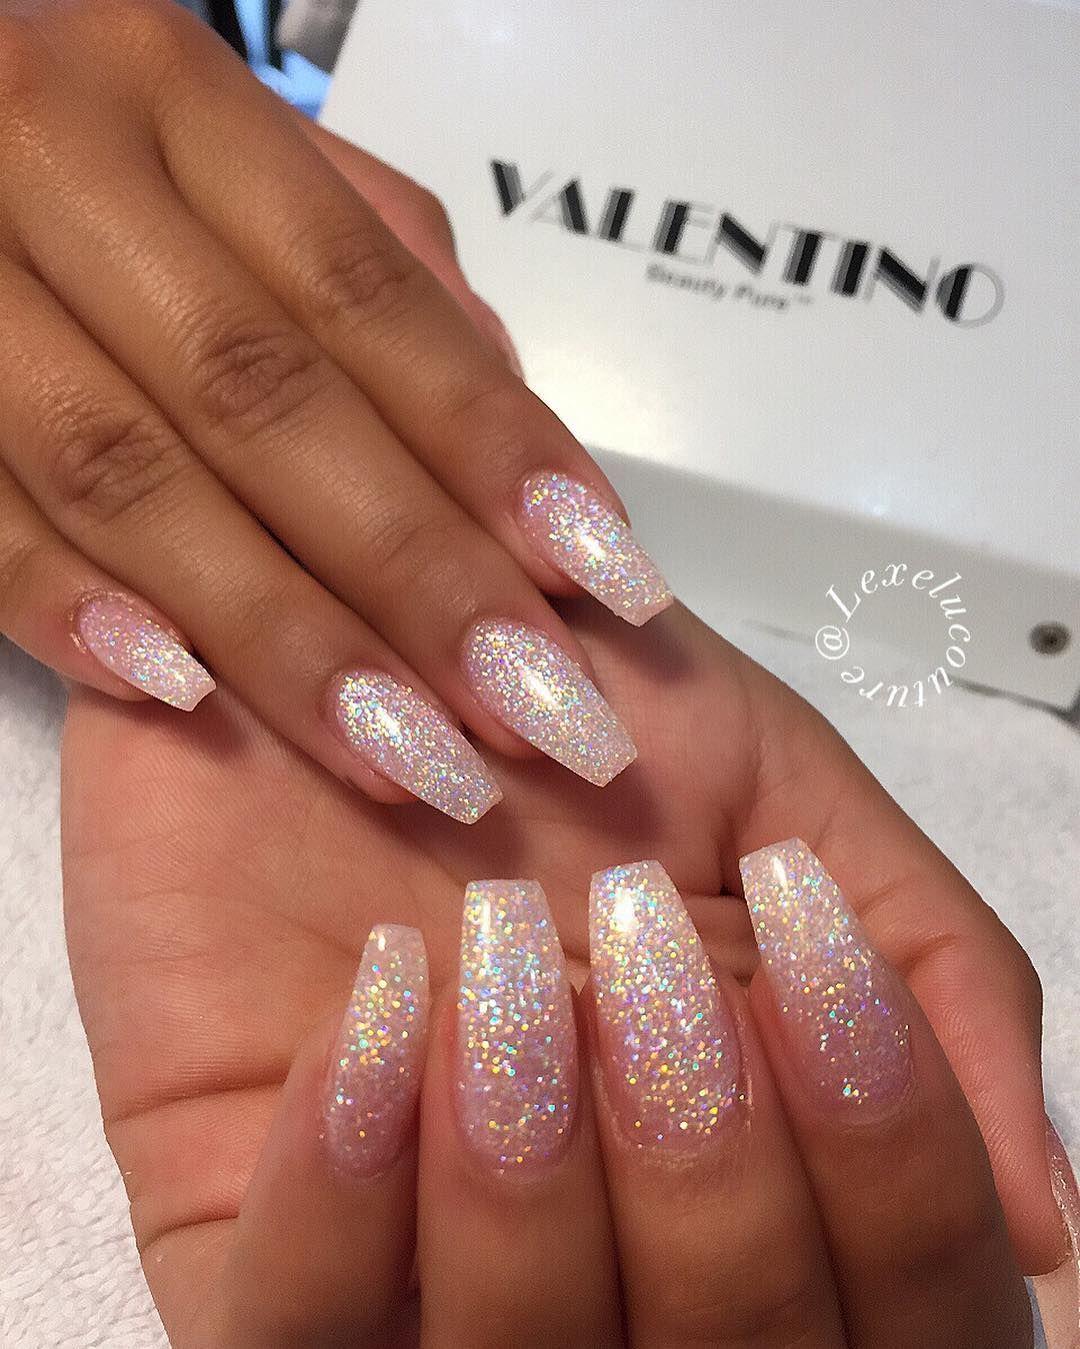 Pin by Valeria Todorova on nails | Pinterest | Acrylics, Nail nail ...